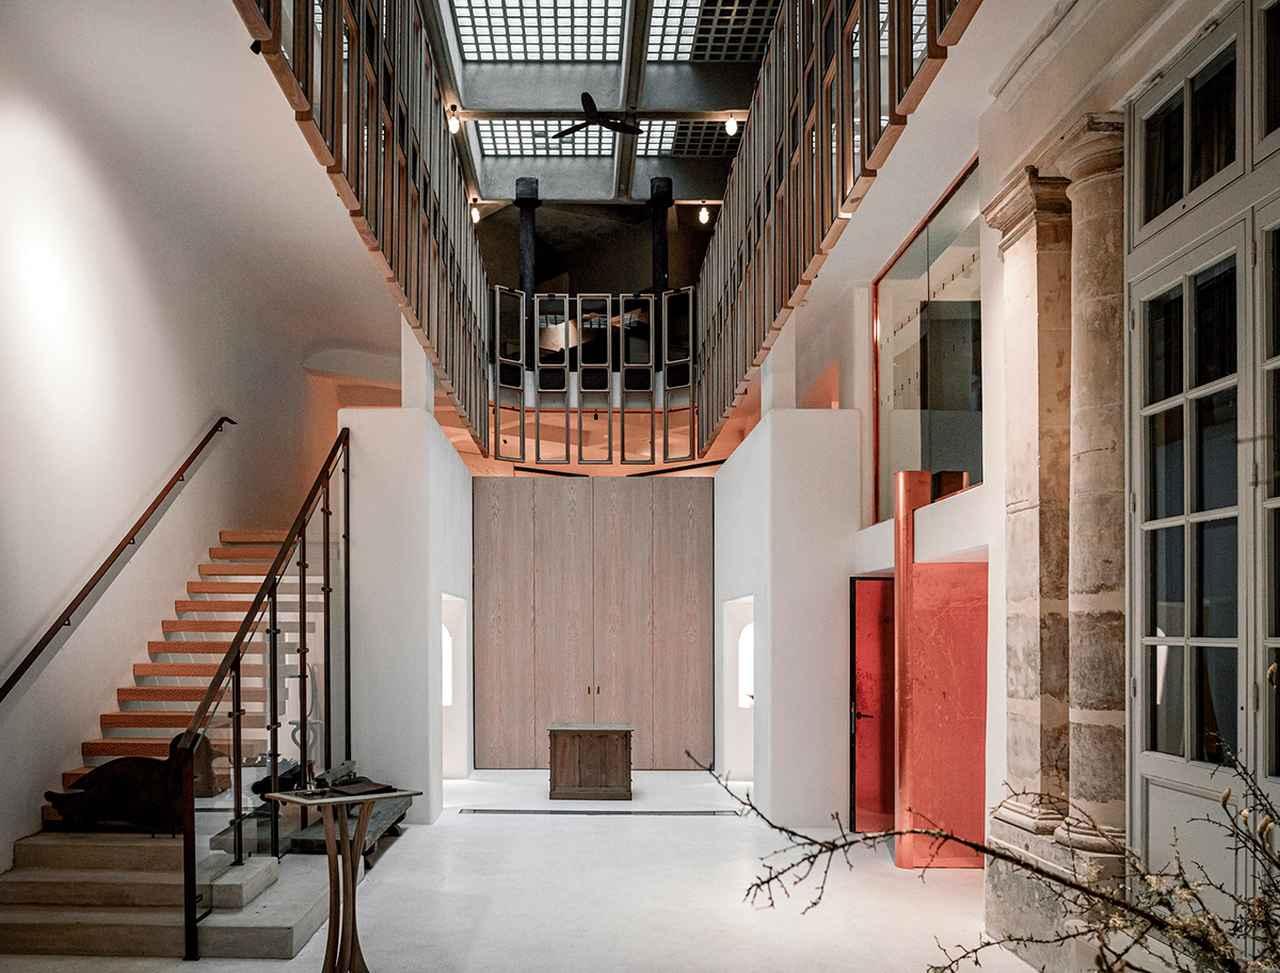 Images : 1番目の画像 - 「OGATA Paris ーー パリの空間に映る 日本の食とデザインの粋」のアルバム - T JAPAN:The New York Times Style Magazine 公式サイト